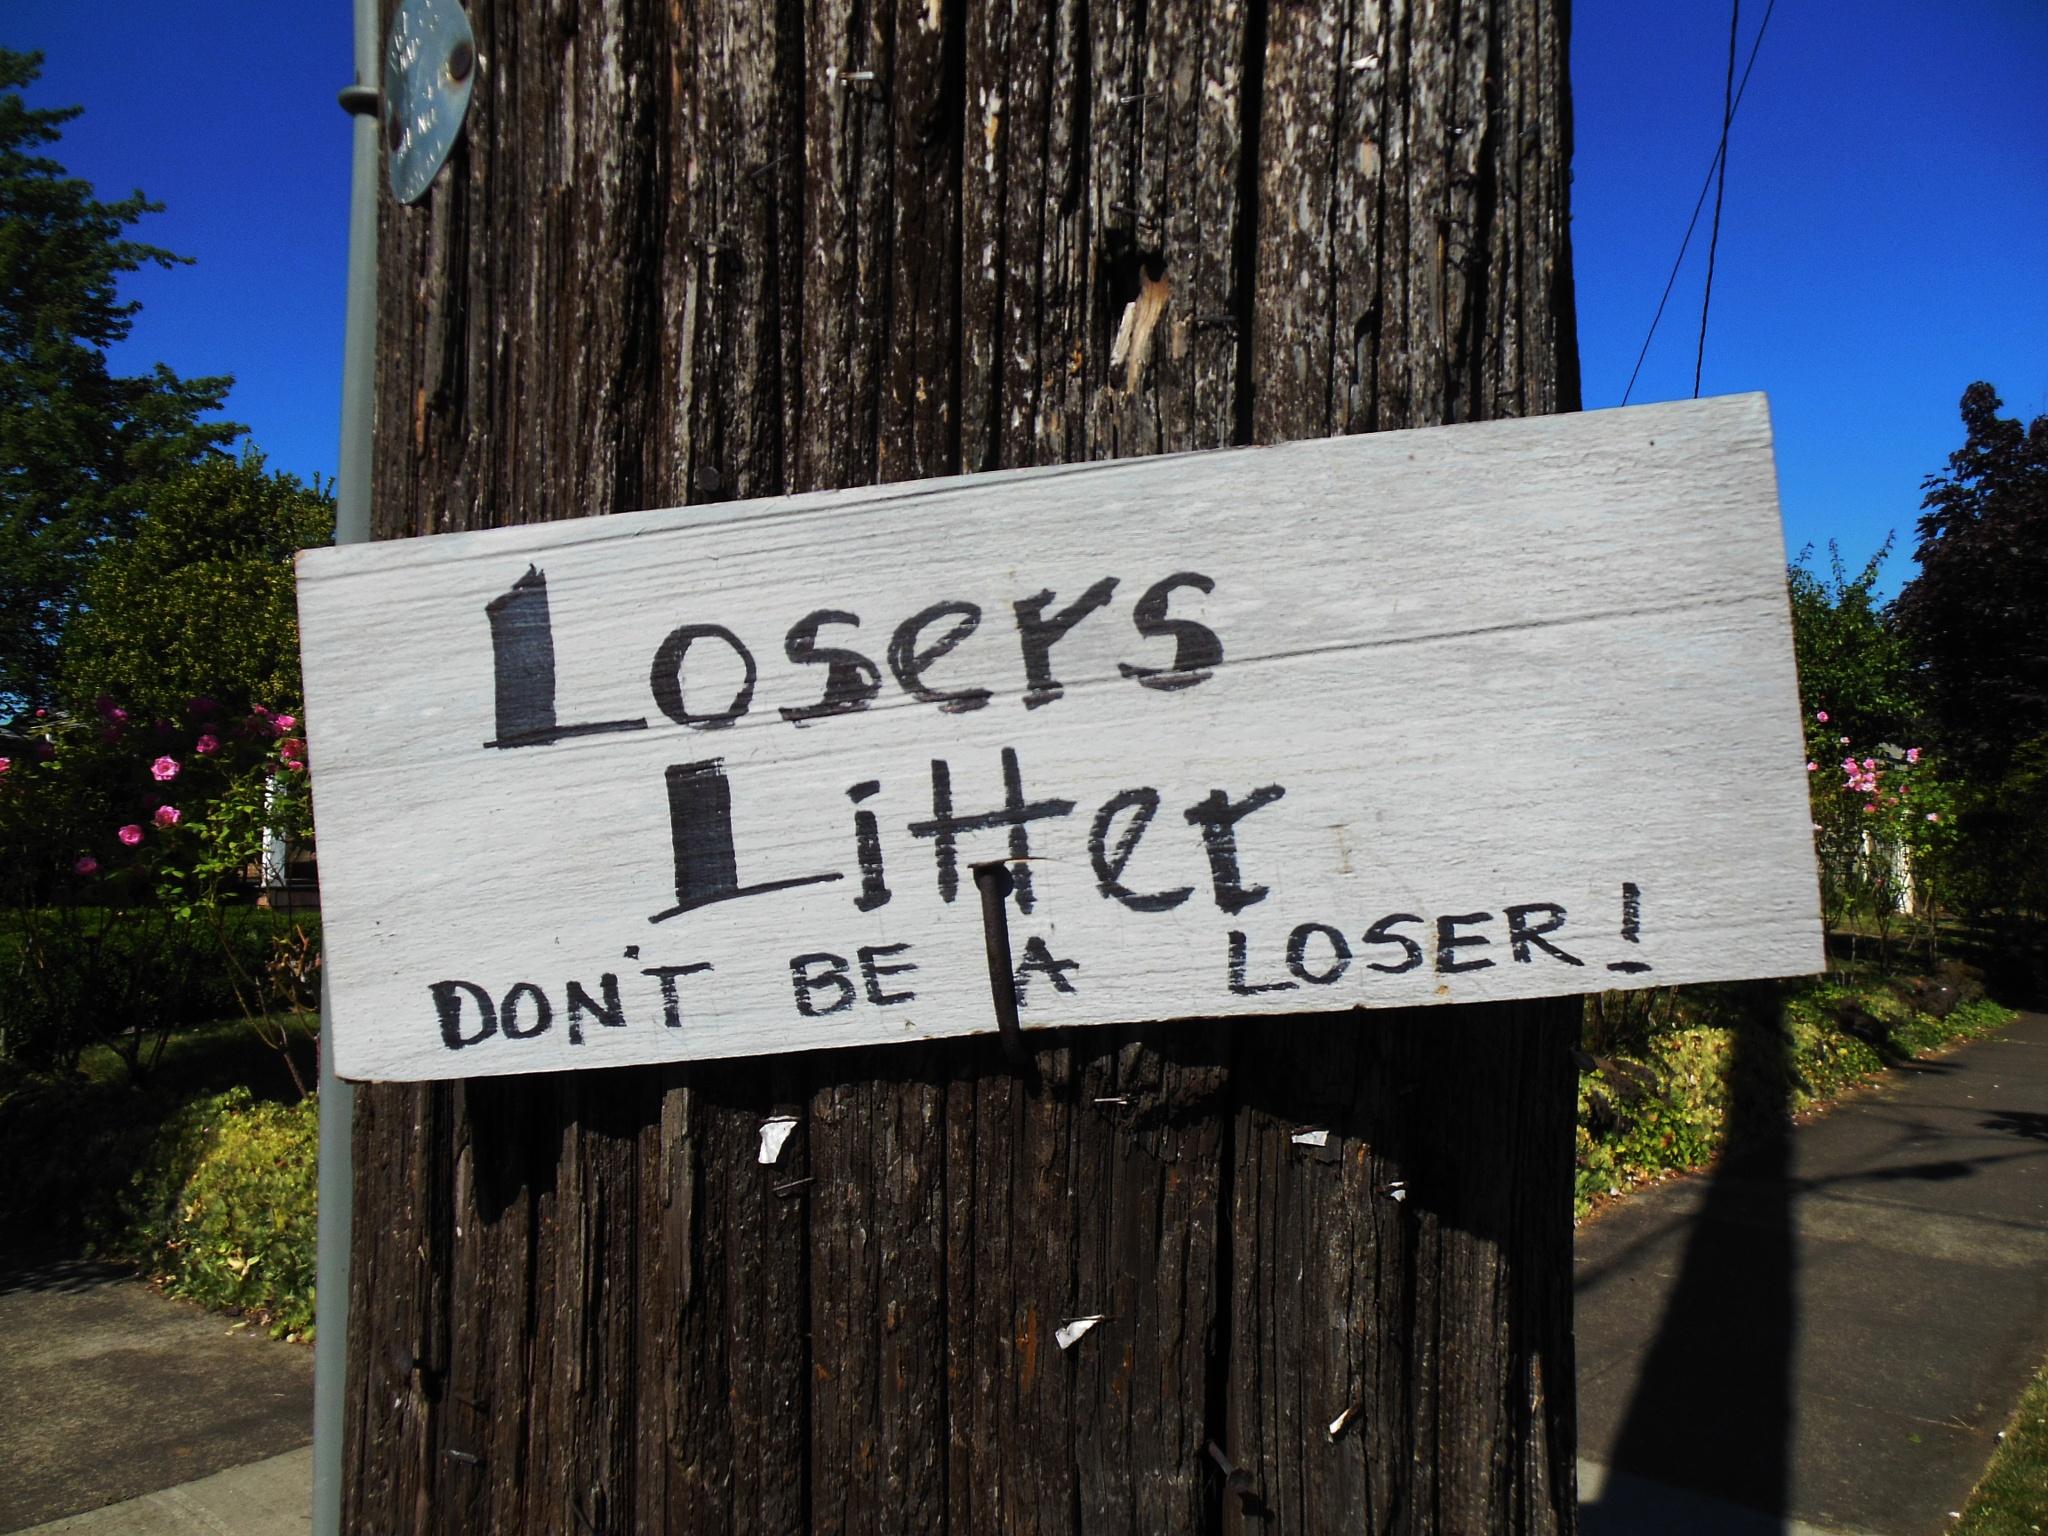 Don't Be A Loser by Des Jardins